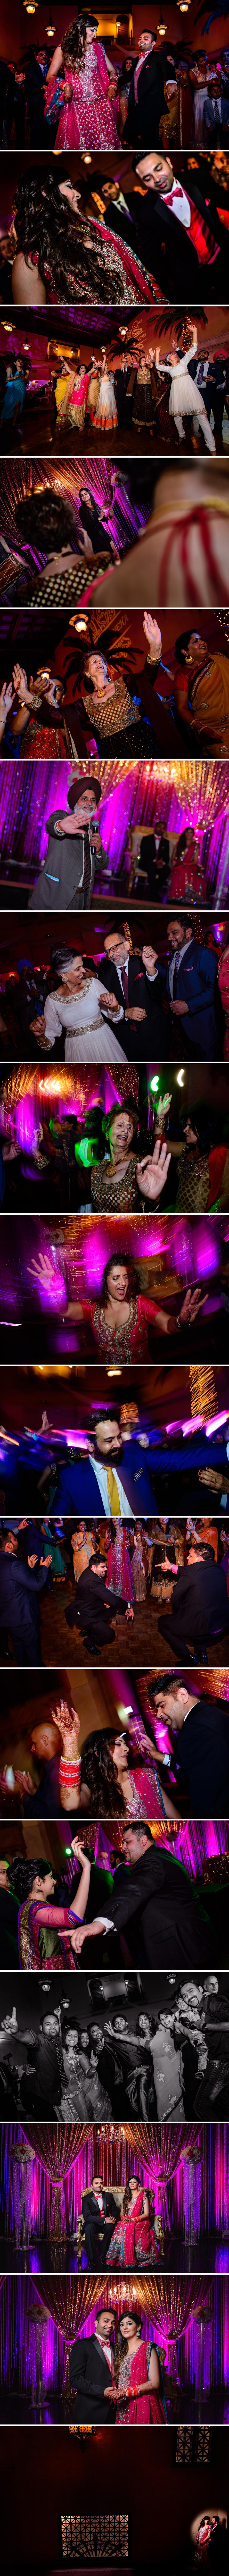 Indian Wedding Corinthian Grand Ballroom San jose